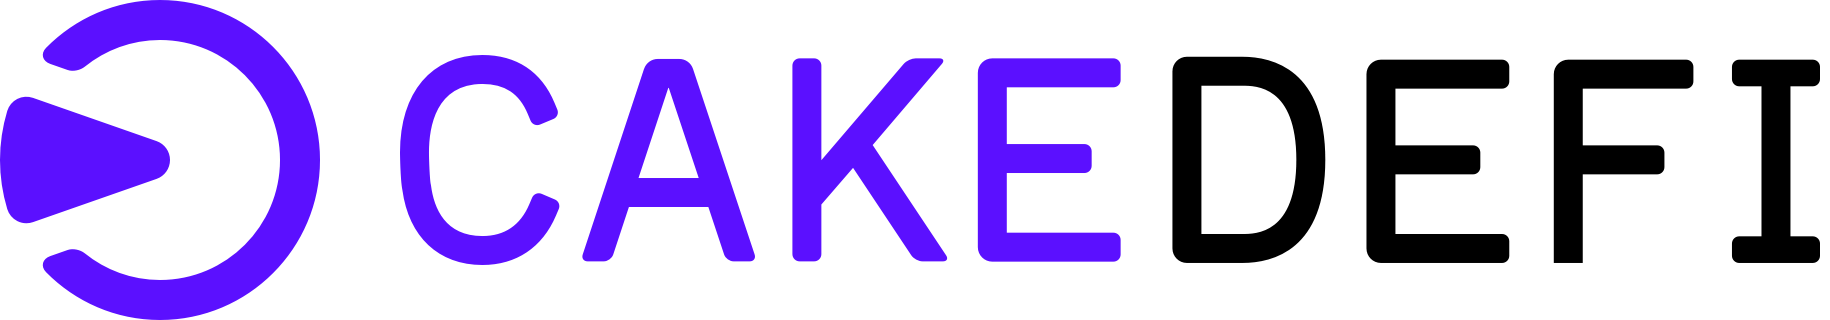 logo-cakedefi-default-lockup-rgb